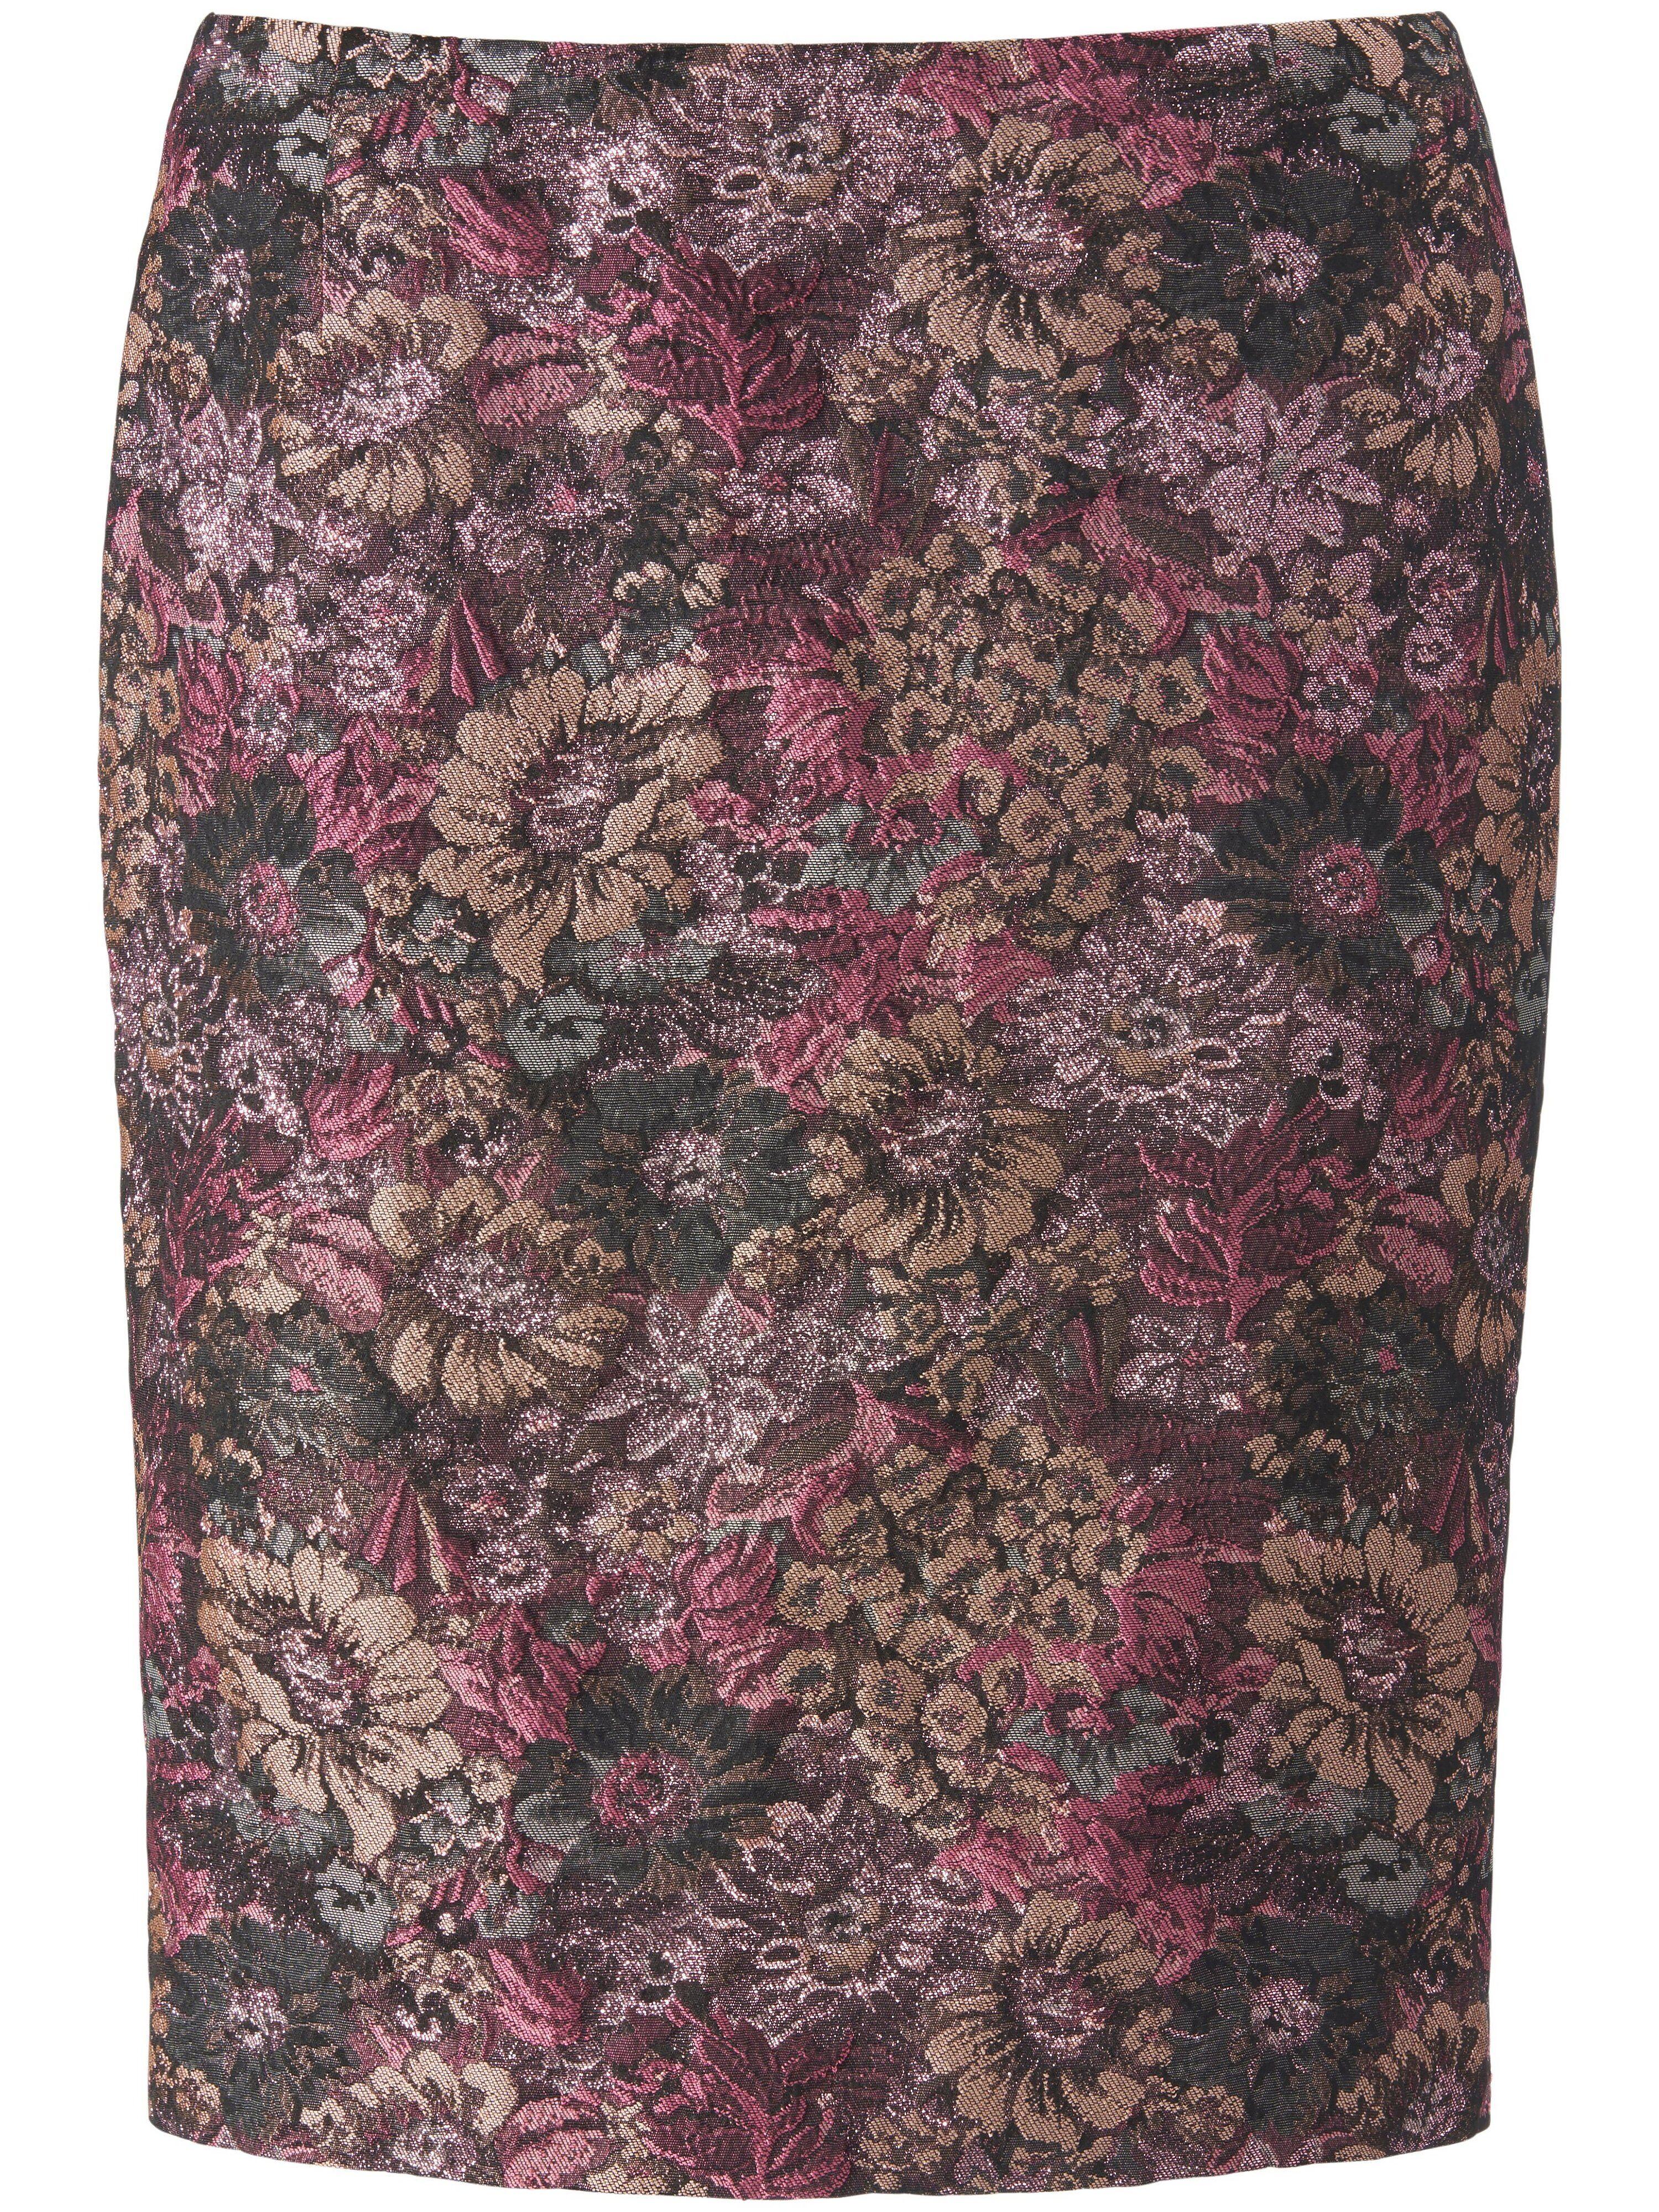 Uta Raasch La jupe ligne droite  Uta Raasch multicolore  - Femme - 40